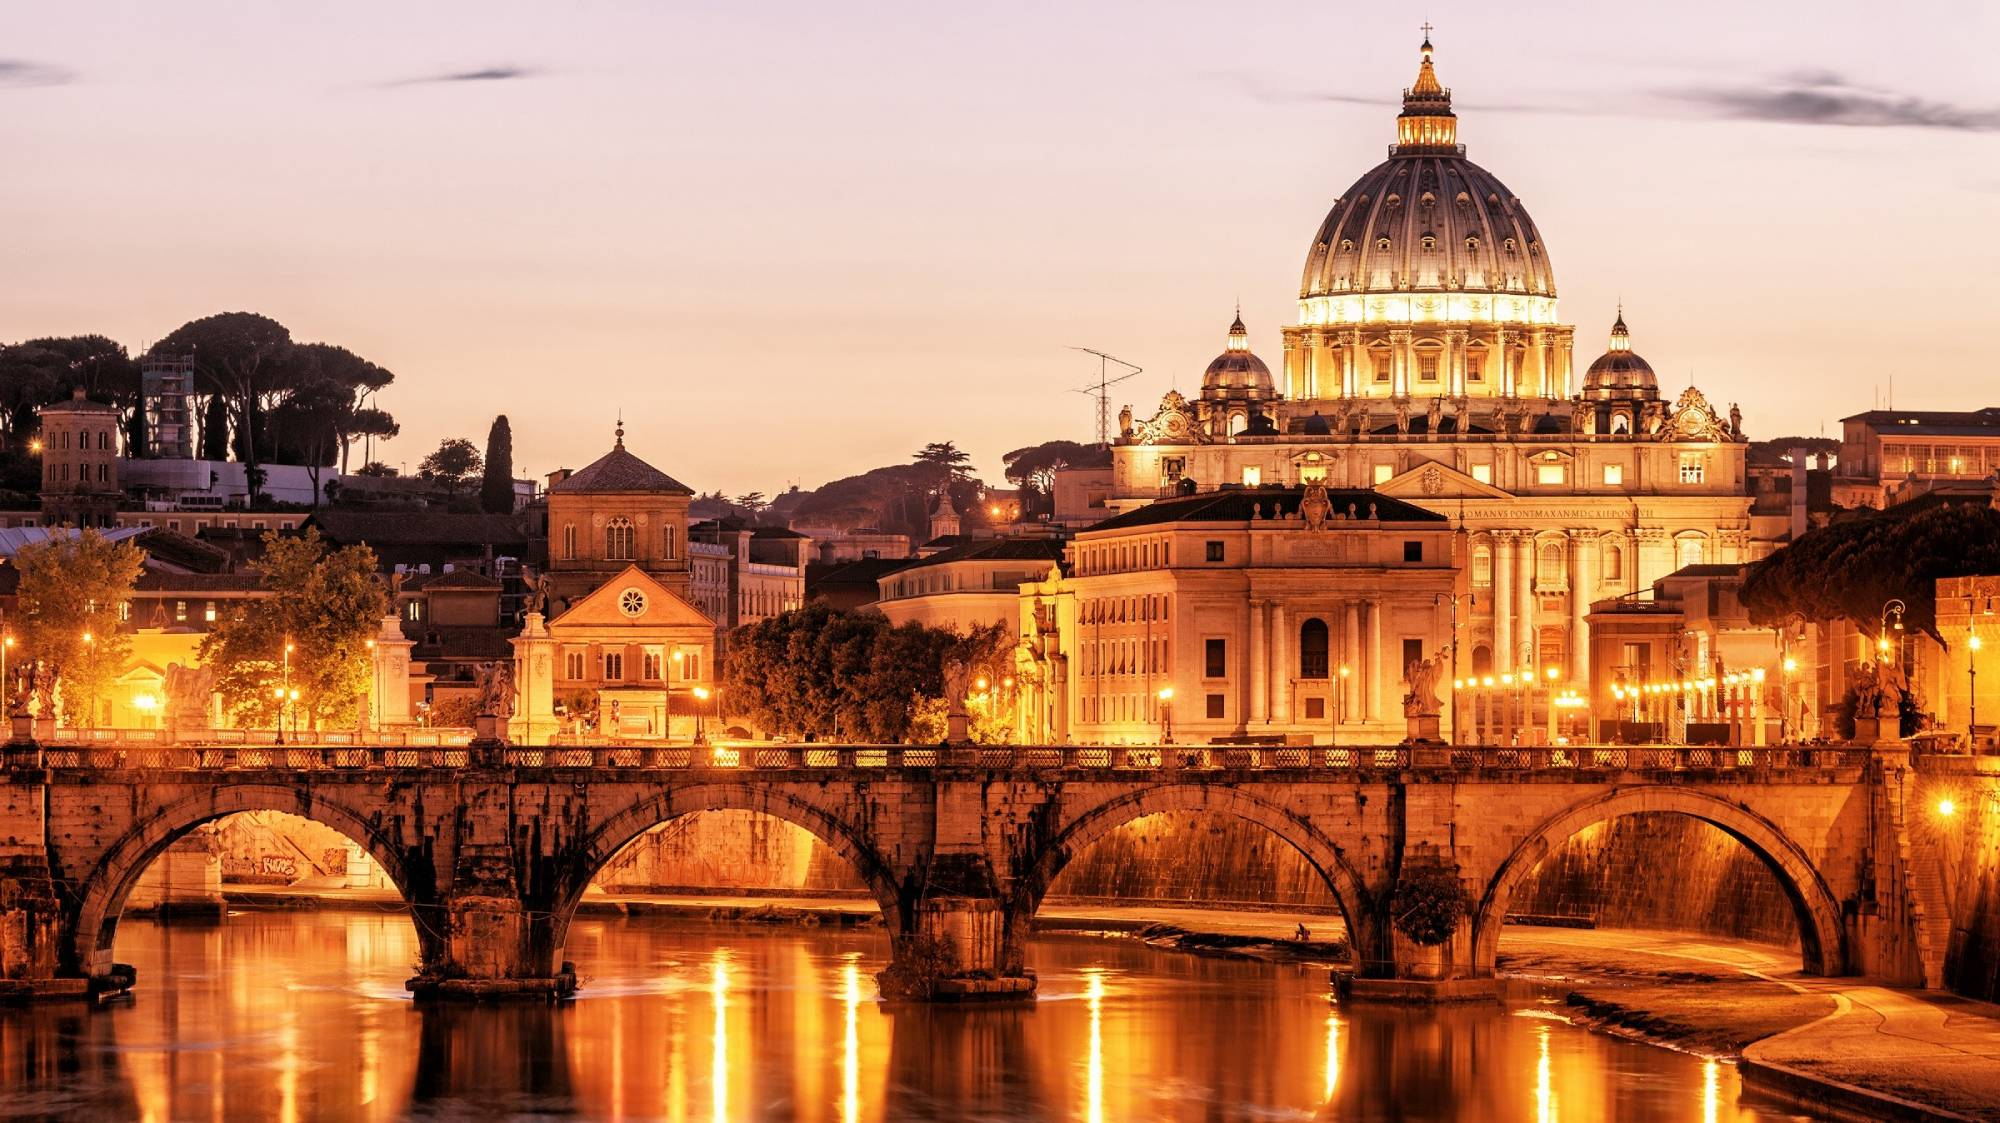 Rome - Travel Blog